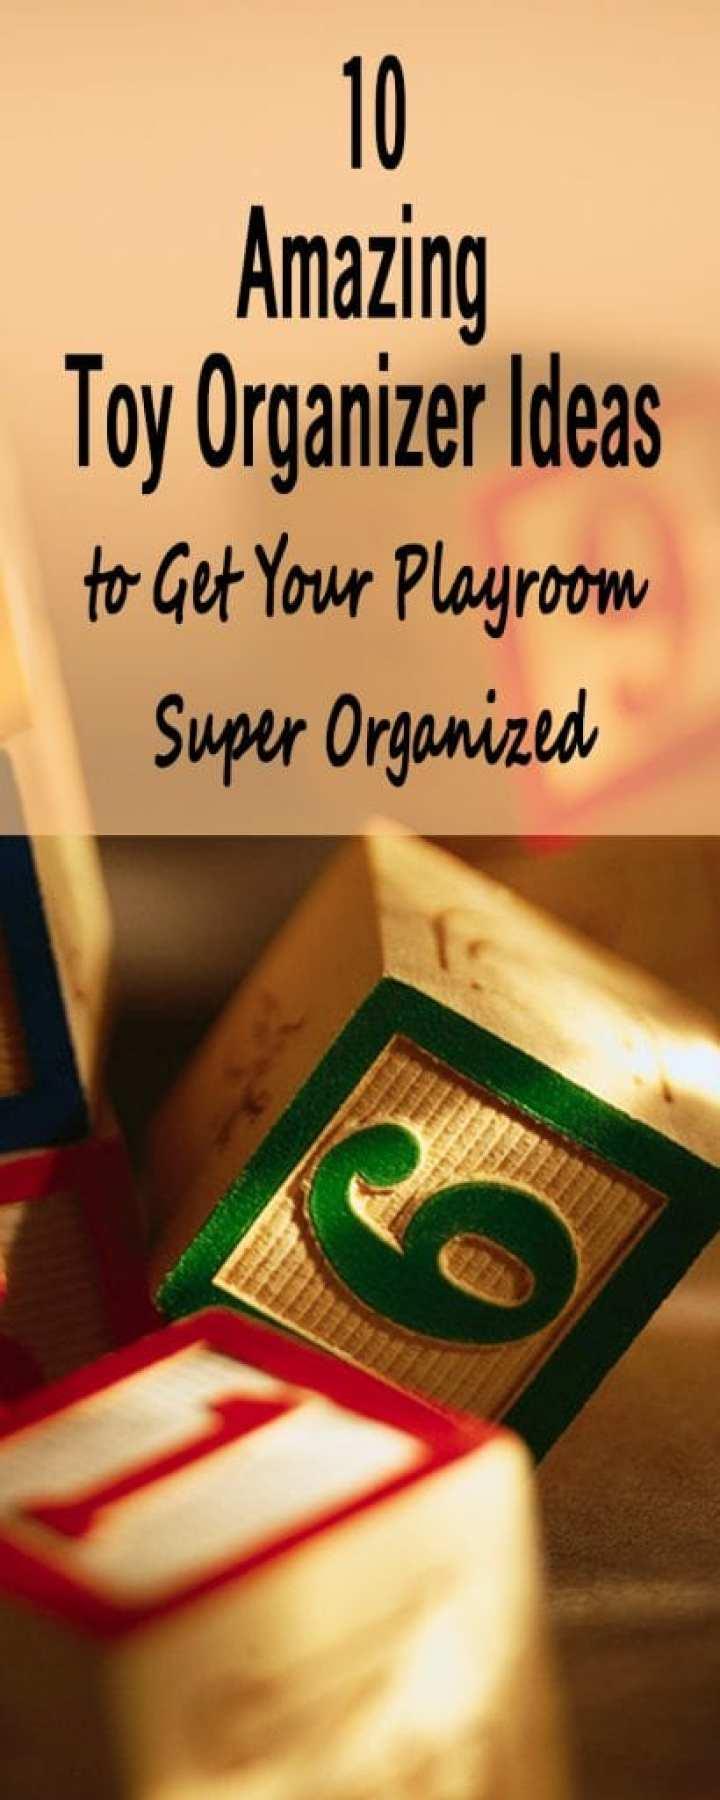 10 Amazing Toy Organizer Ideas to Get Your Playroom Super Organized